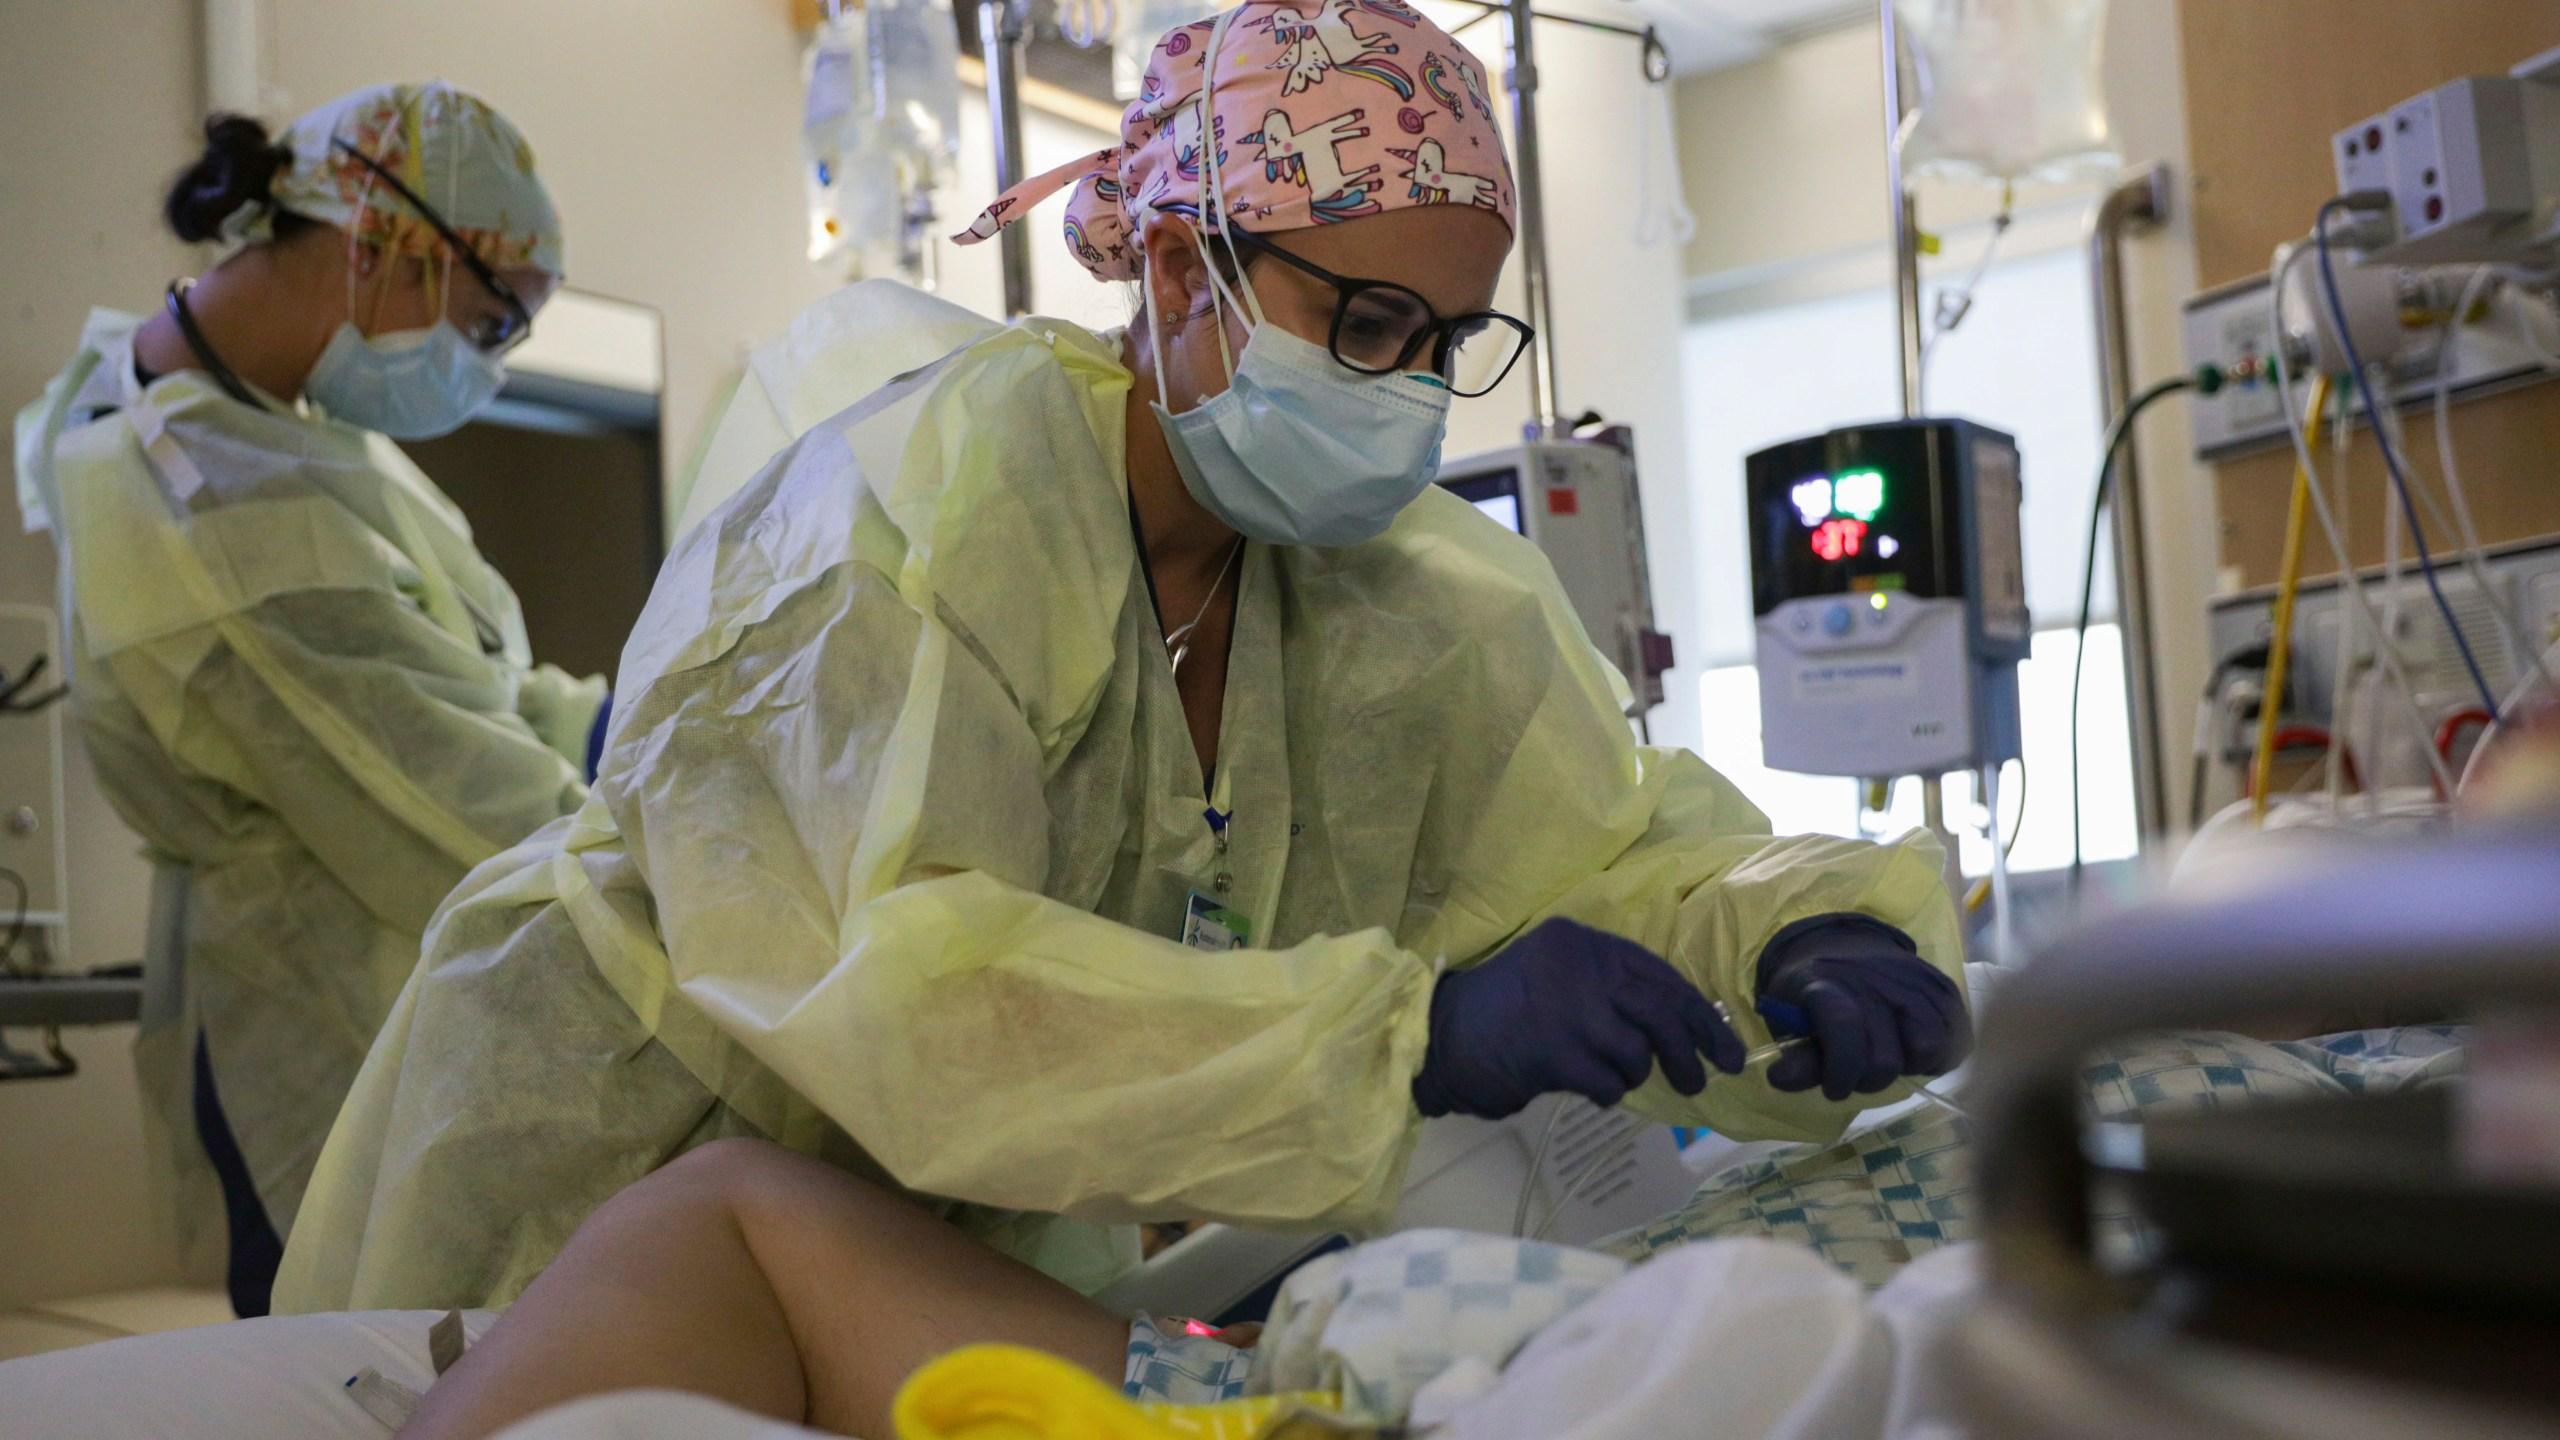 U.S. Army Medical Team Decompresses Idaho Hospital